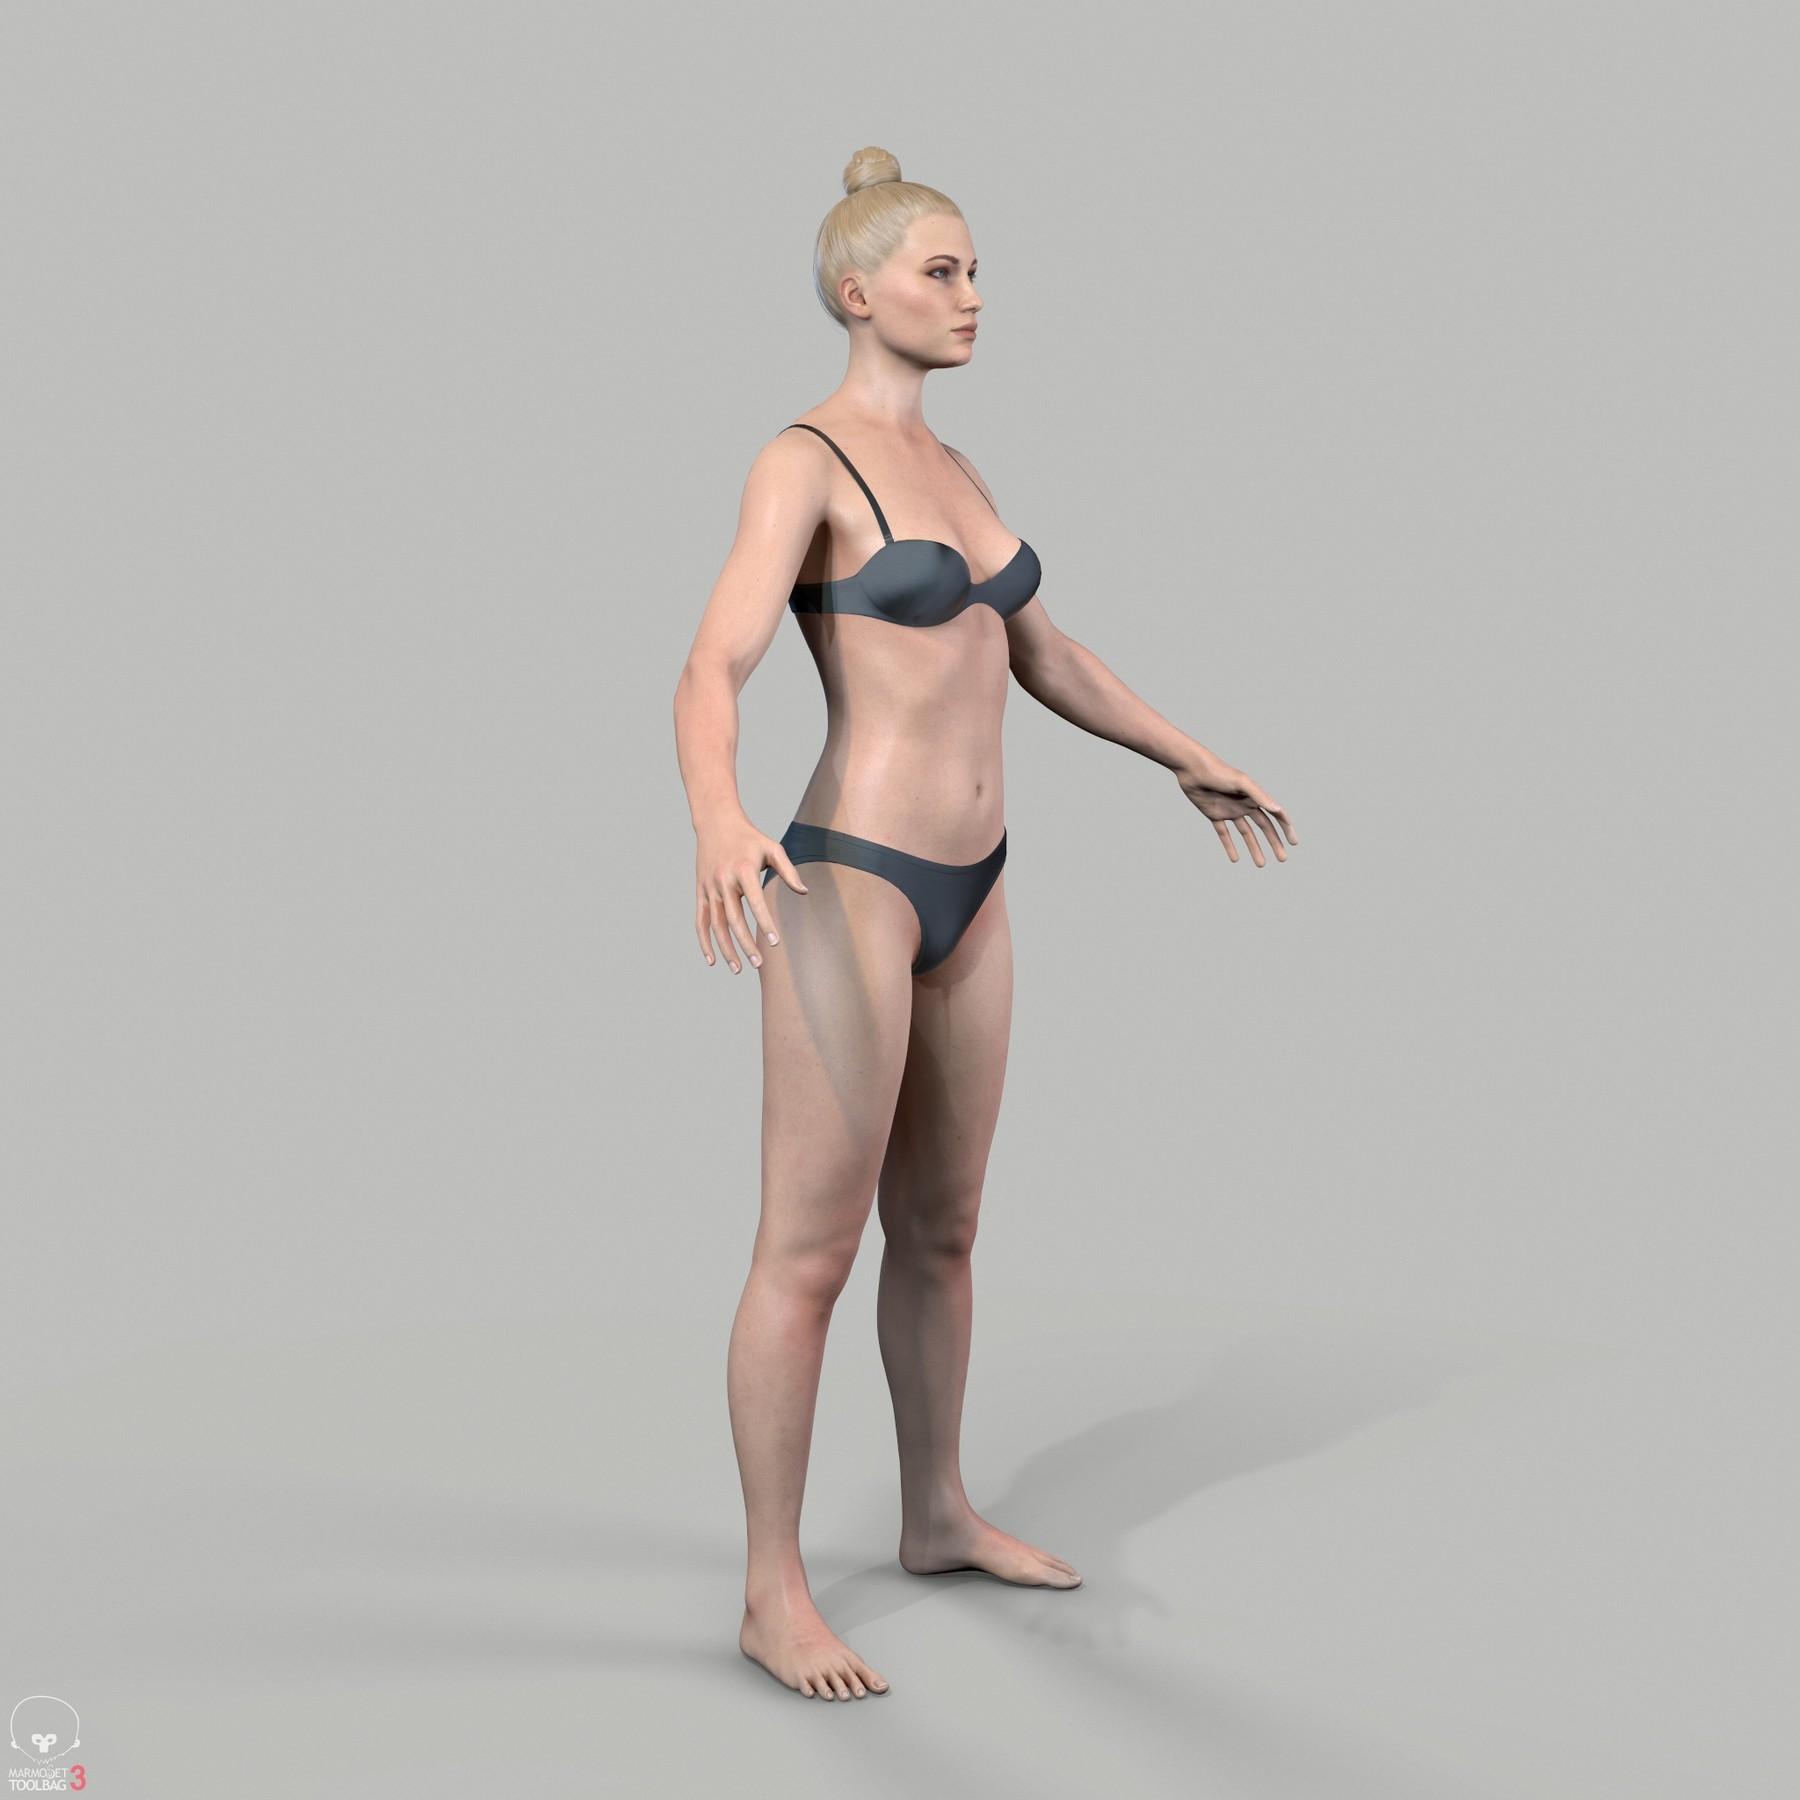 Averagecaucasianfemale by alexlashko 00003